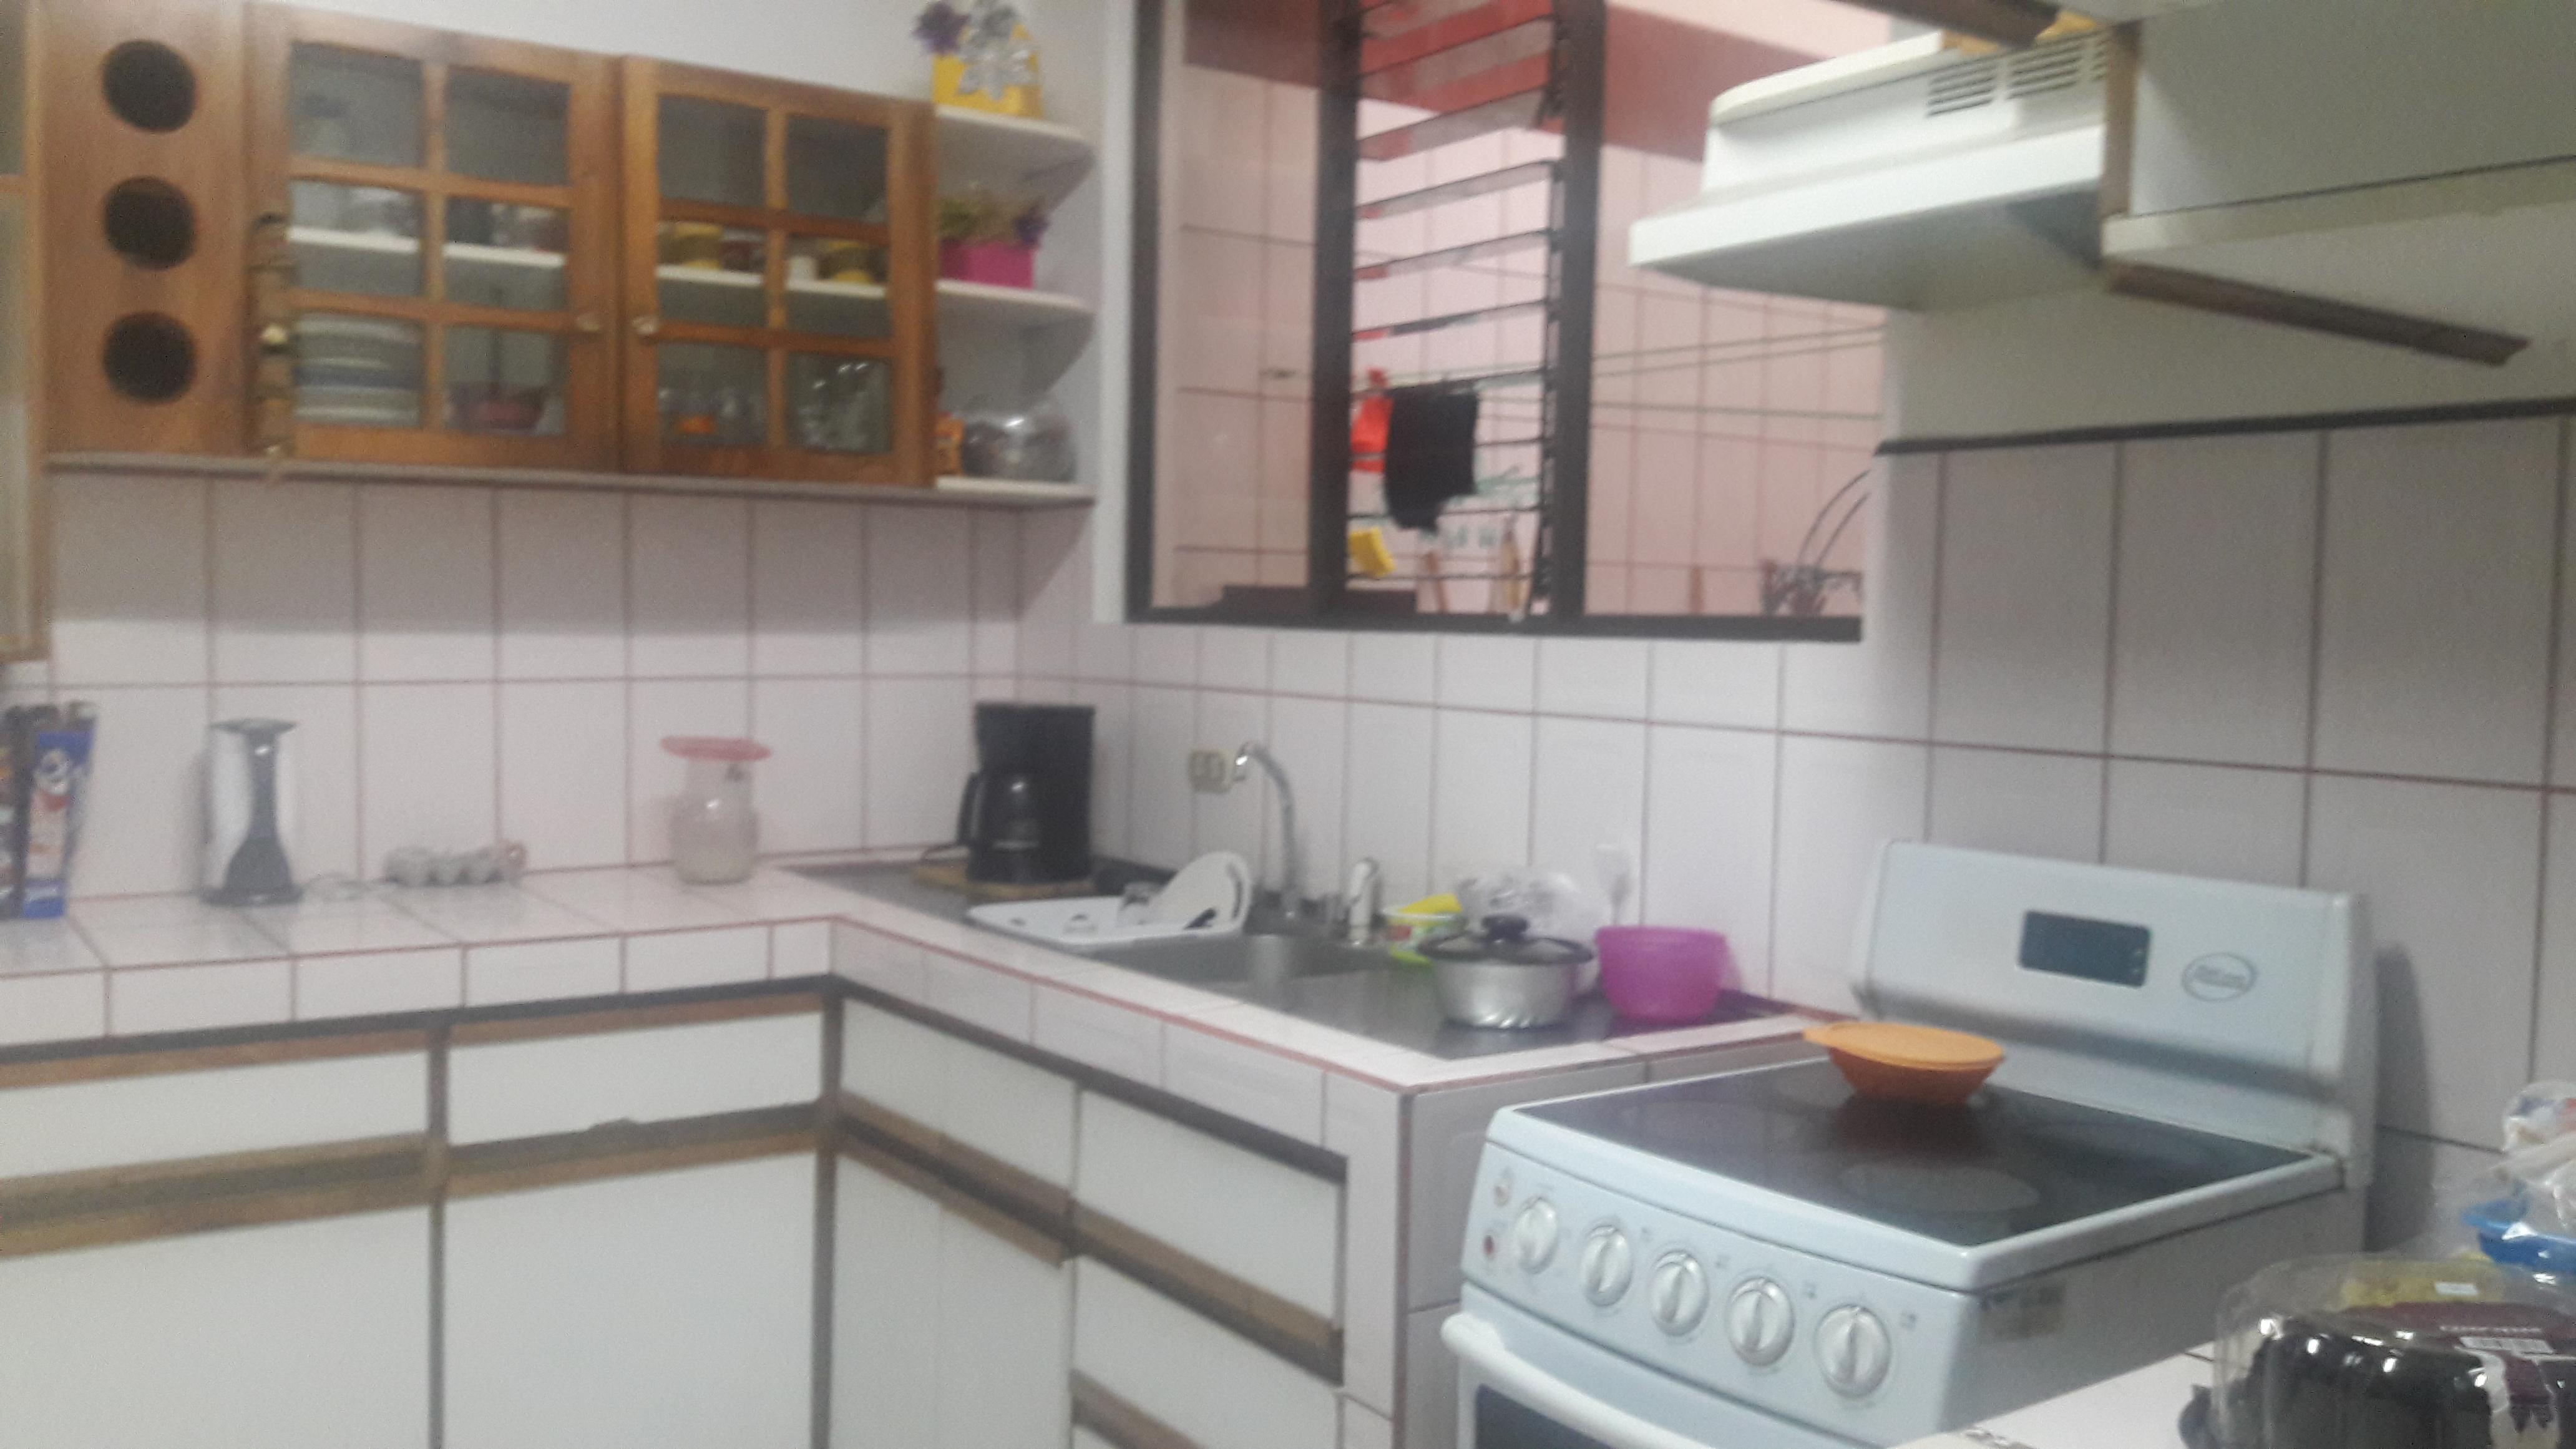 Cocina (habitación) - Wikiwand